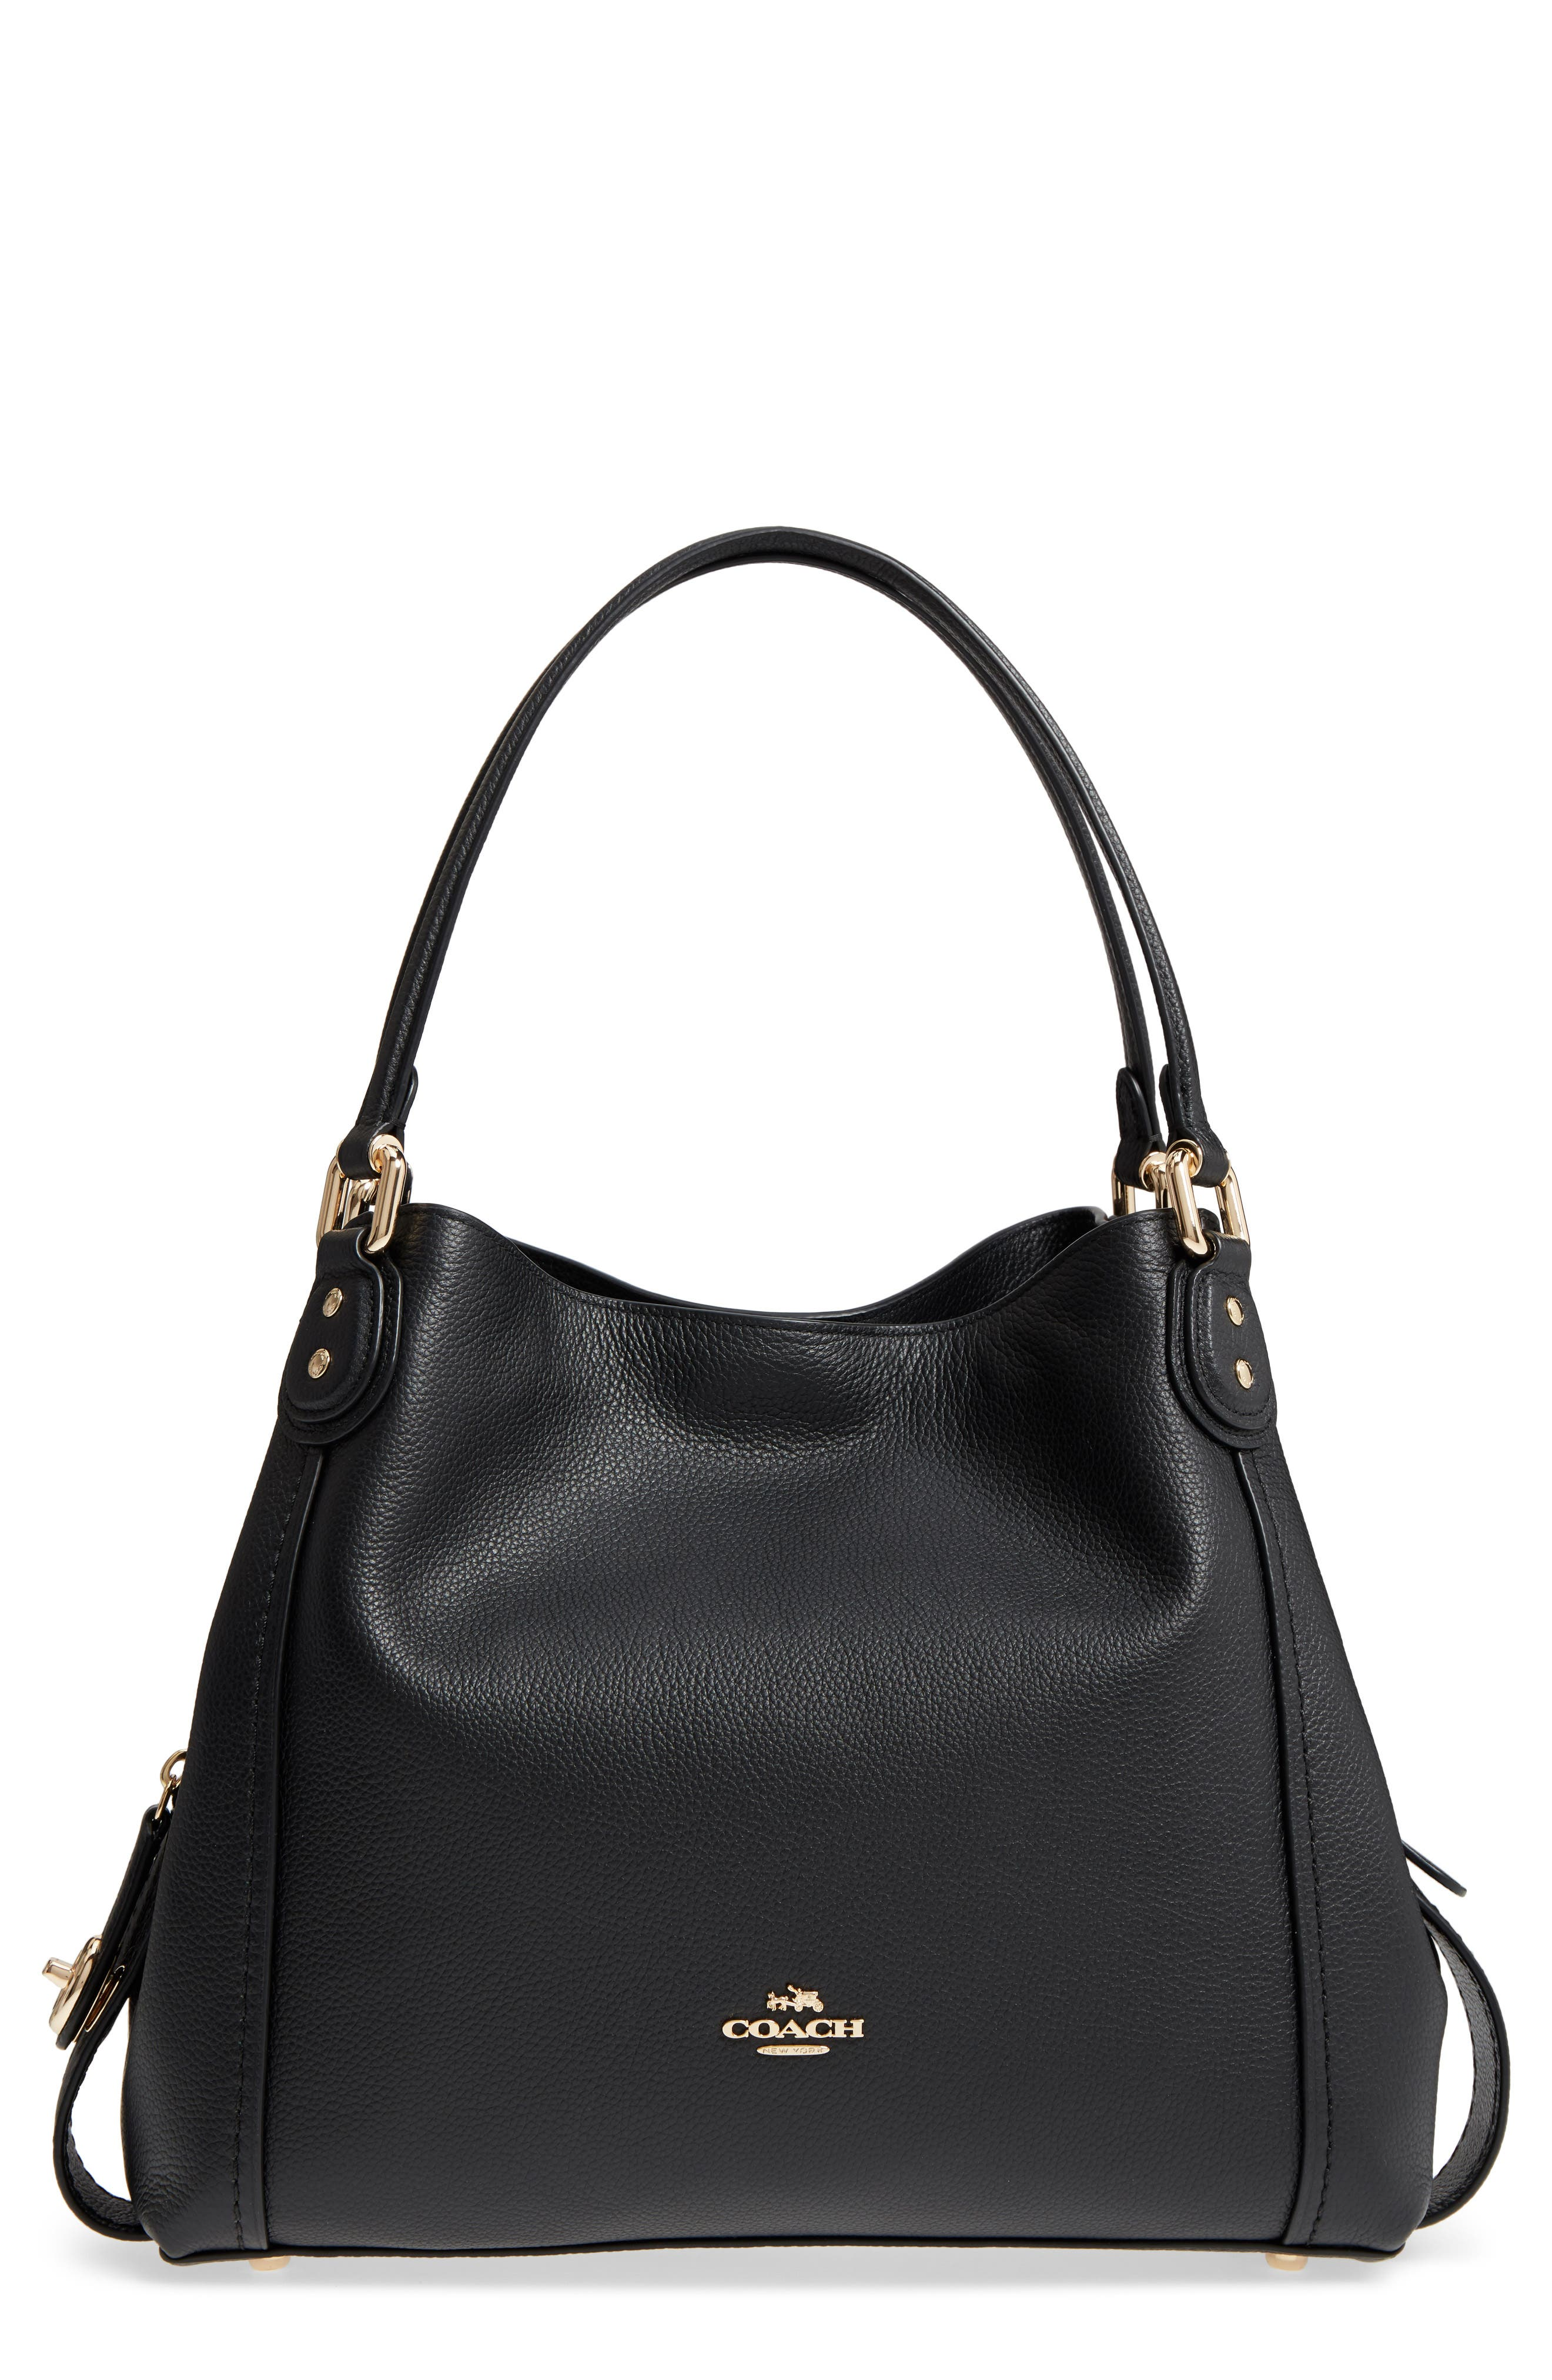 Edie 31 Pebbled Leather Shoulder Bag,                             Main thumbnail 1, color,                             BLACK